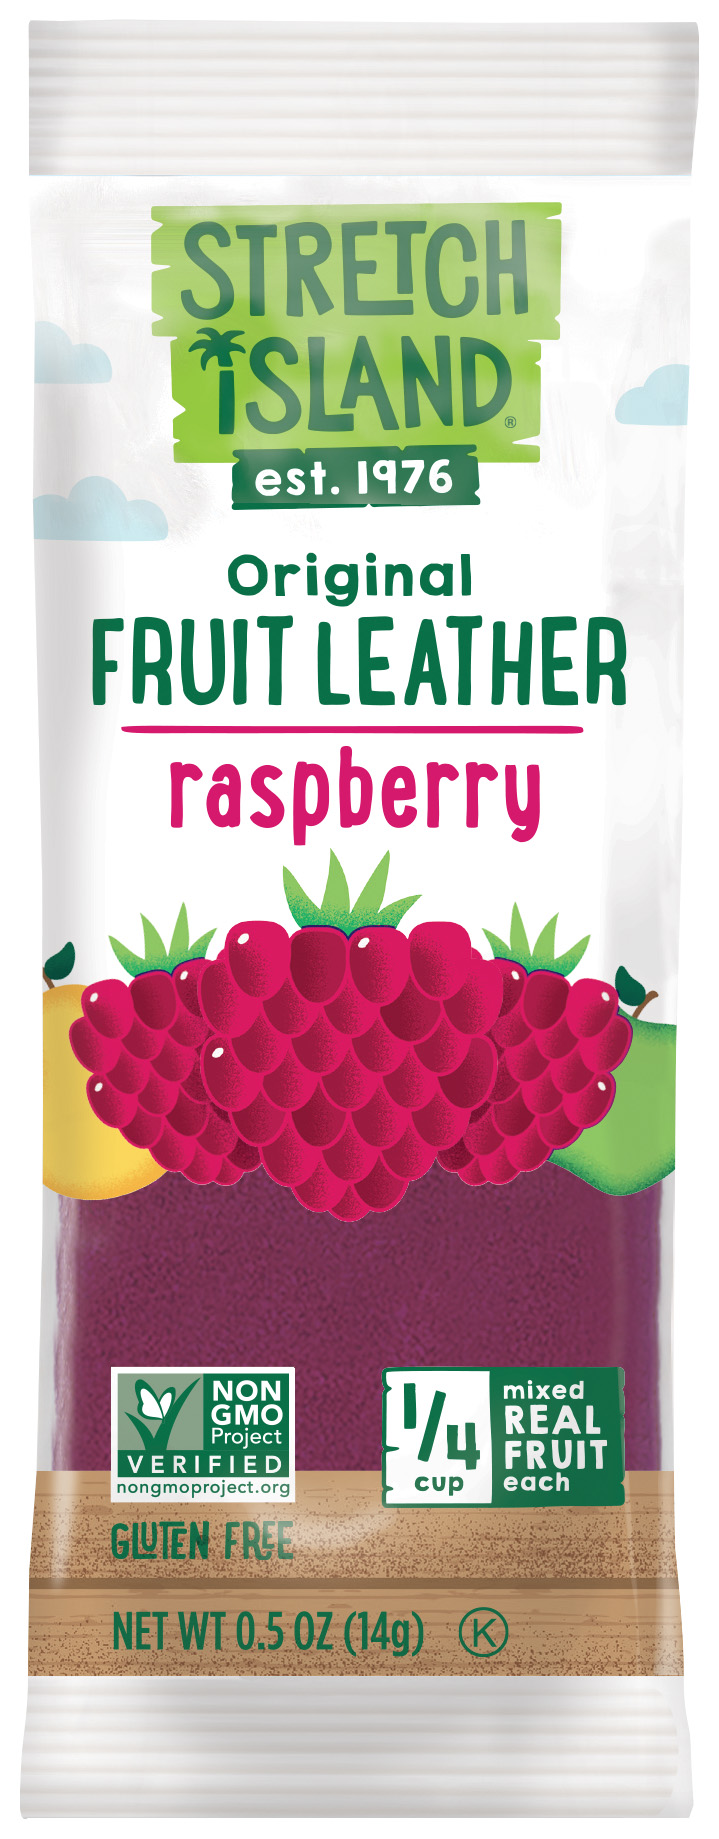 Healthy Office Snacks, Stretch Island Fruit Leather – Raspberry